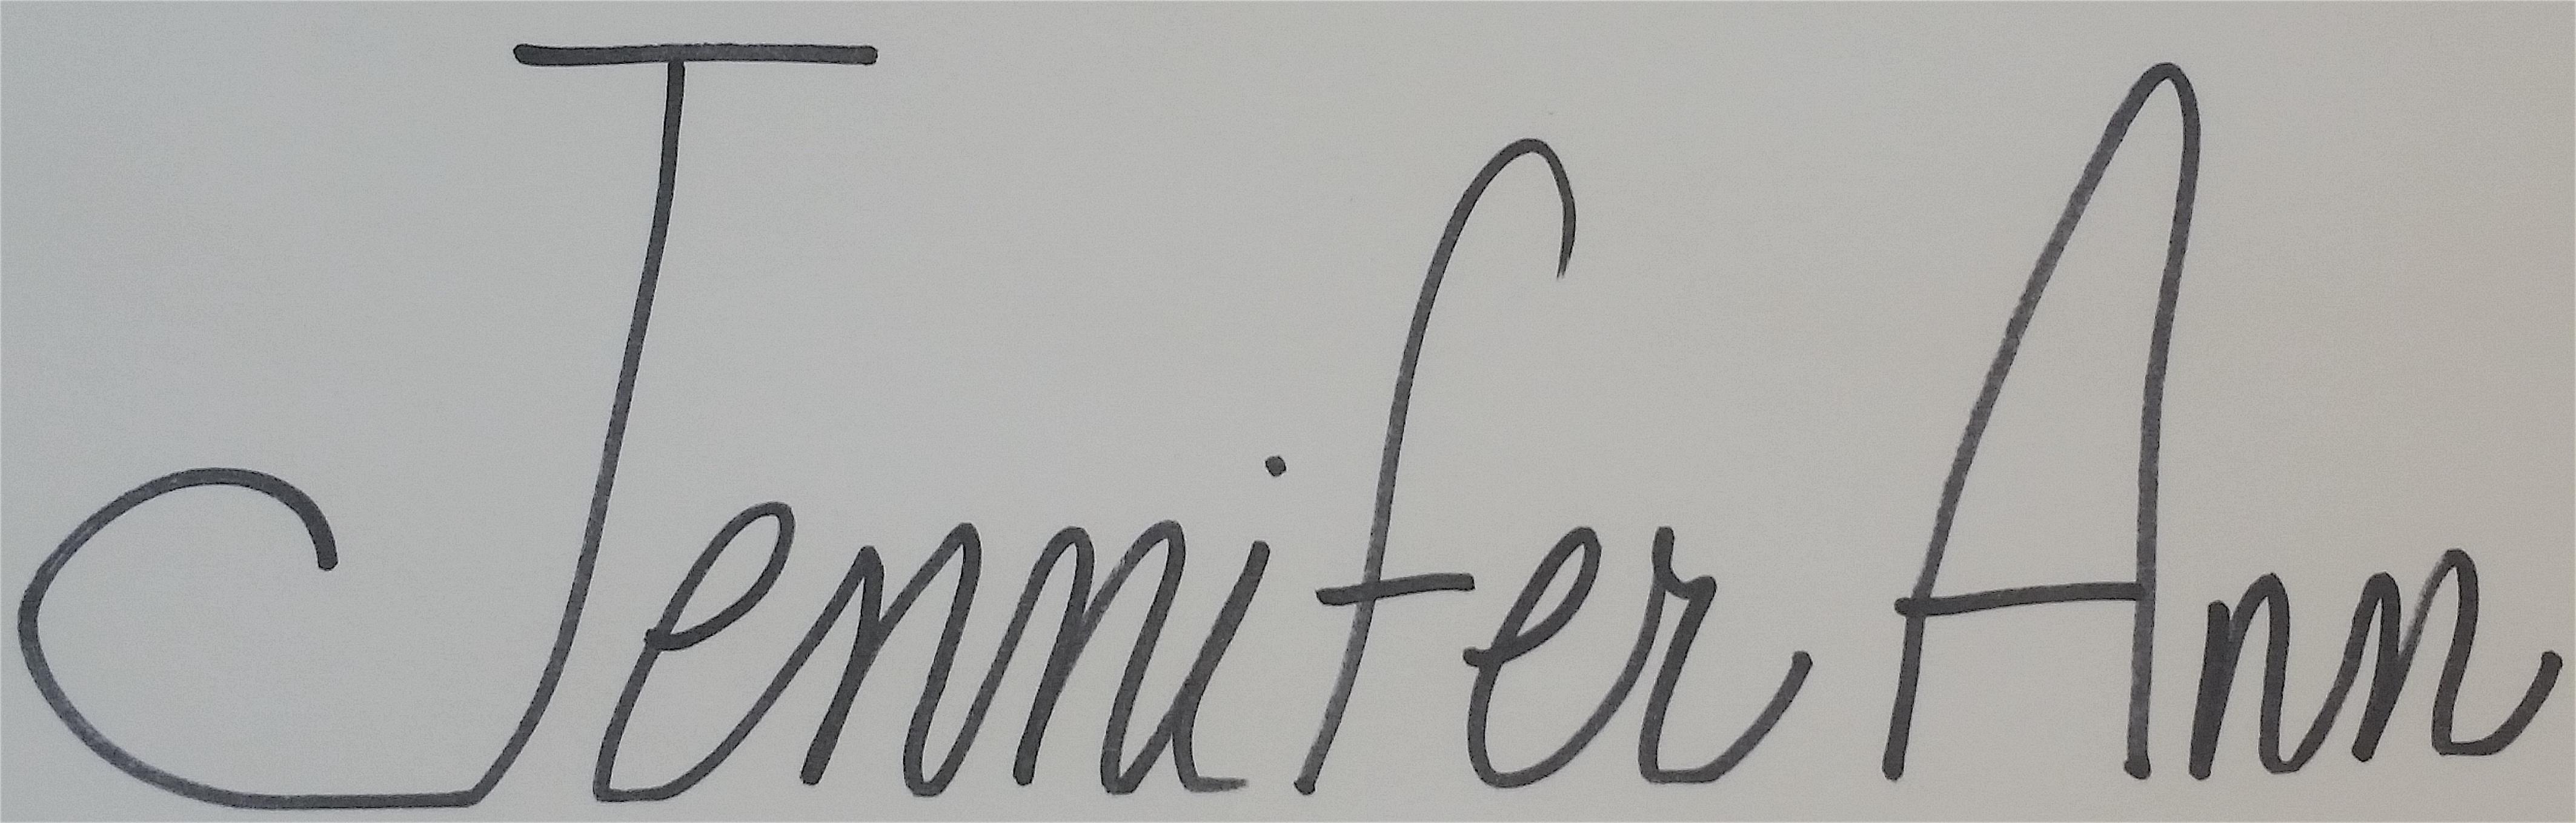 jennifer ANN Rogers's Signature